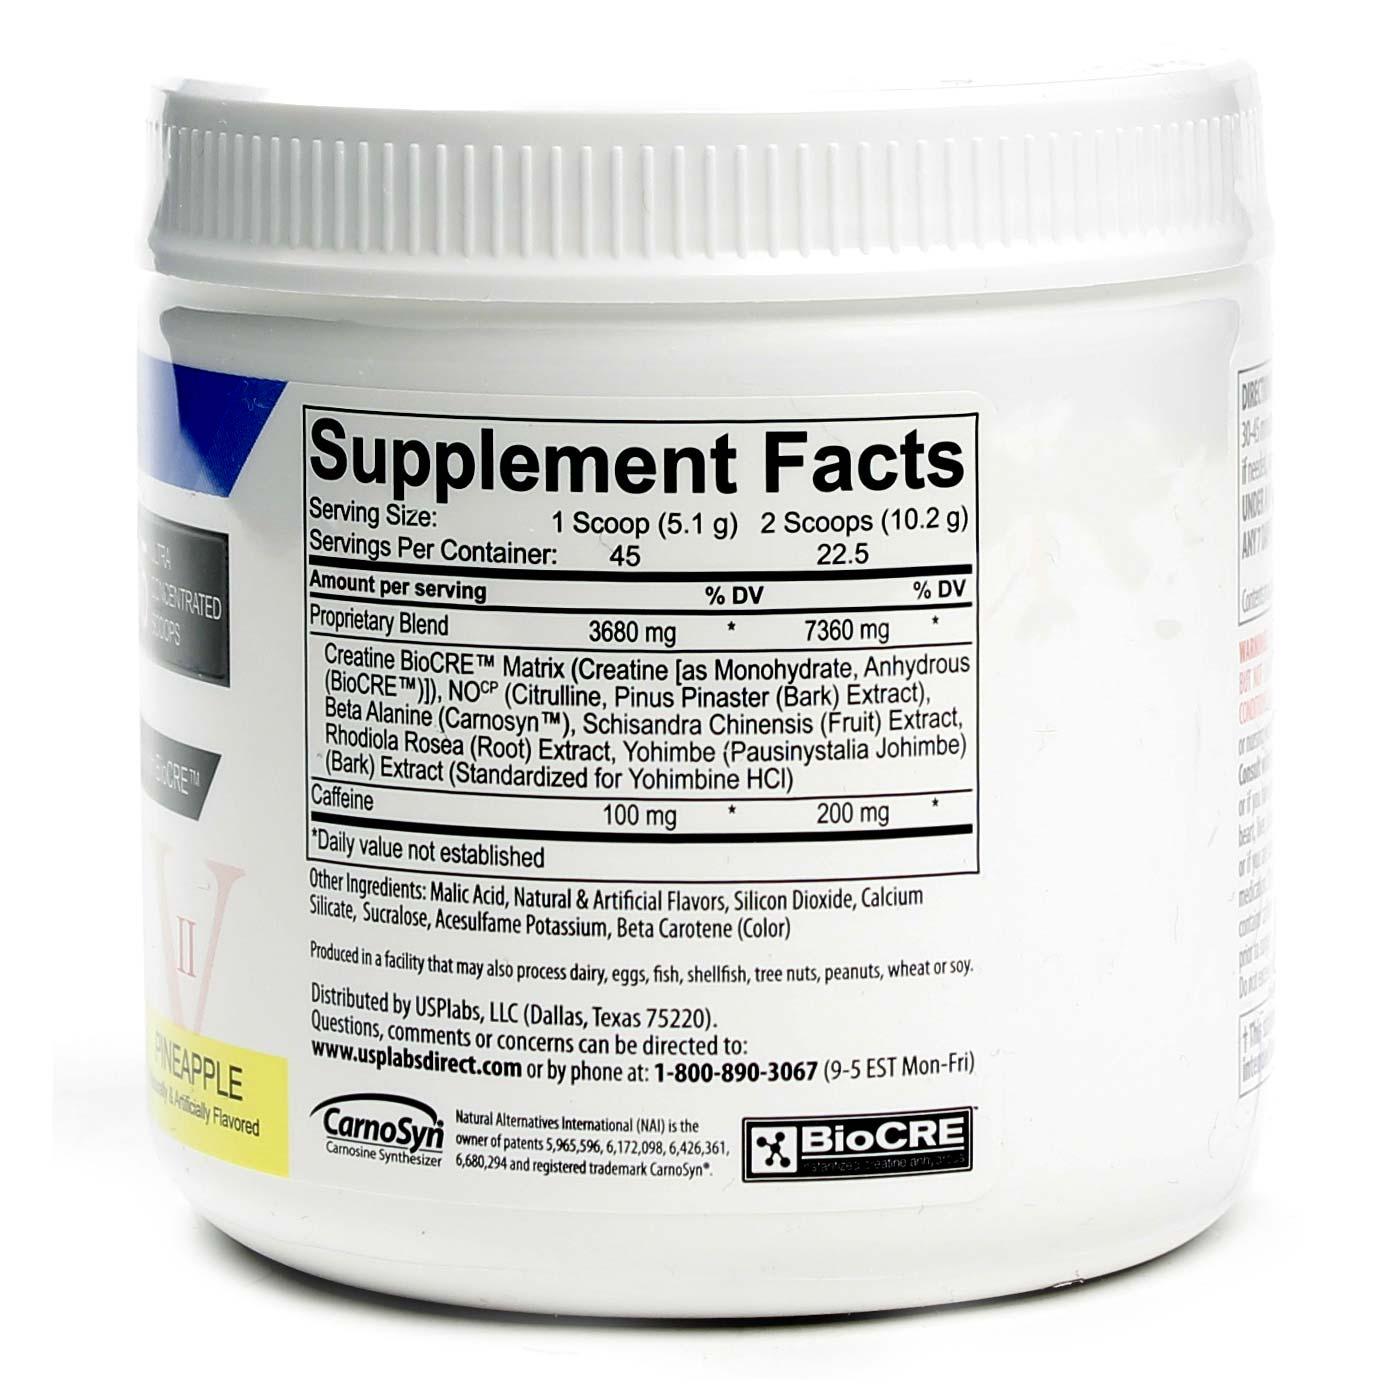 USP Labs Jack3d CNS Stimulant